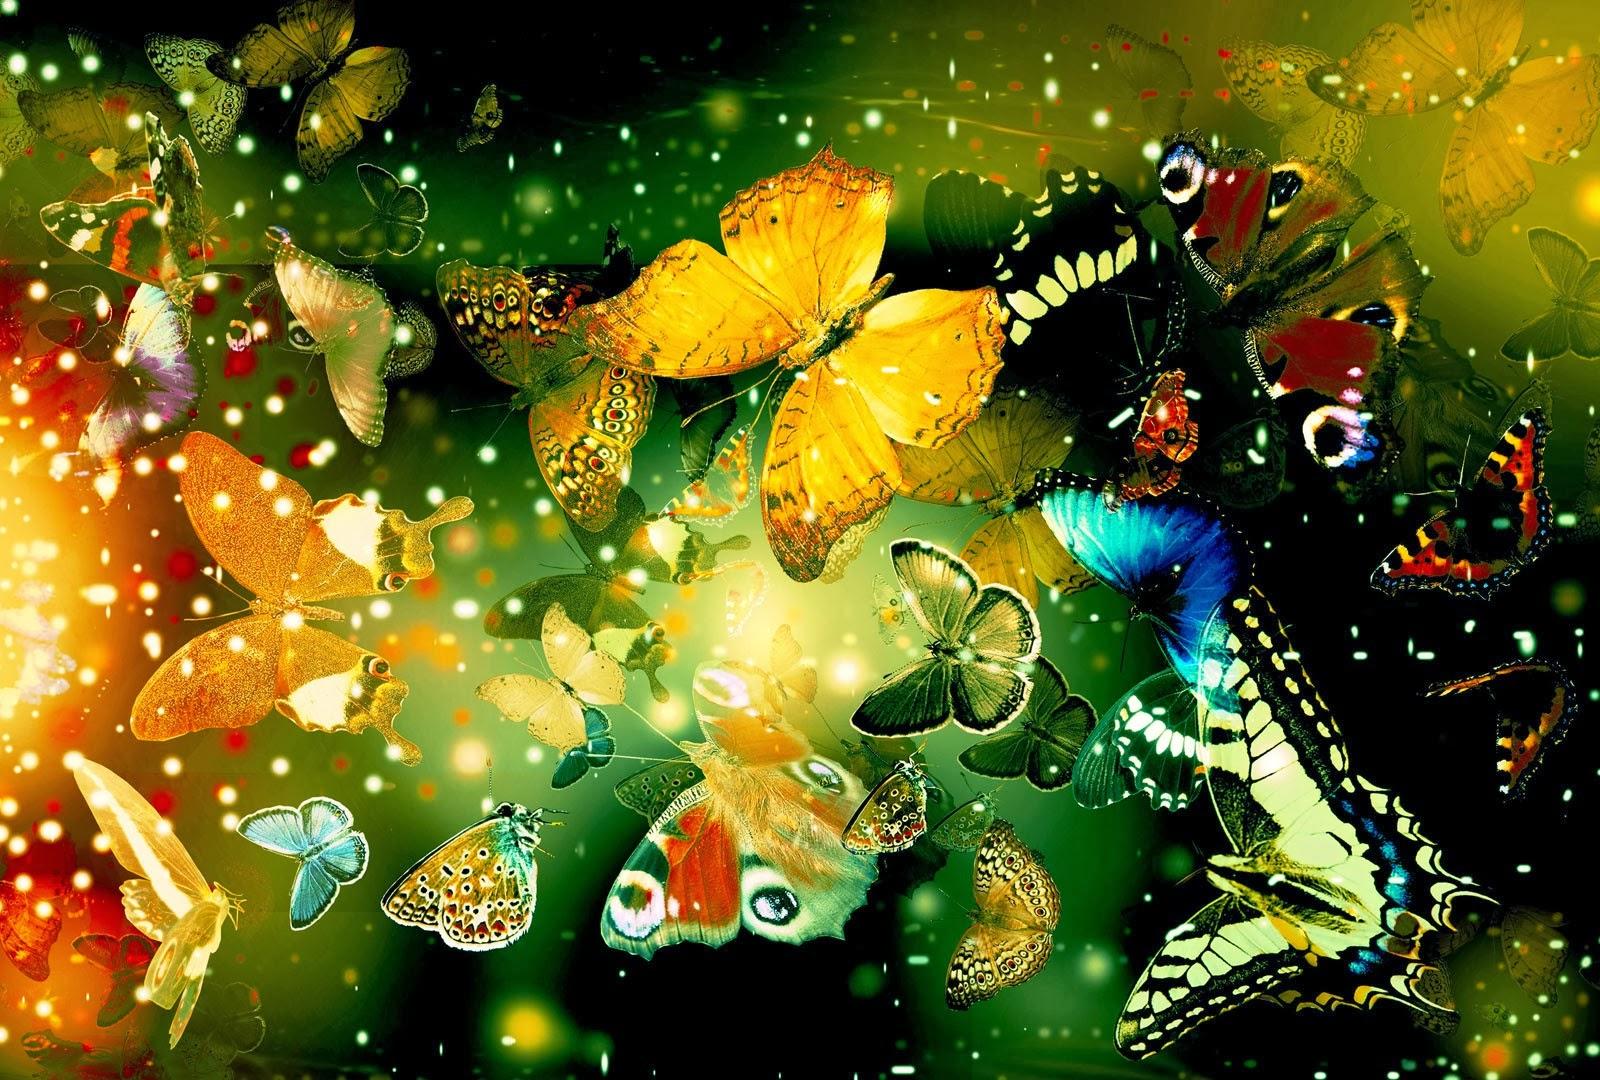 fantasie wallpaper: